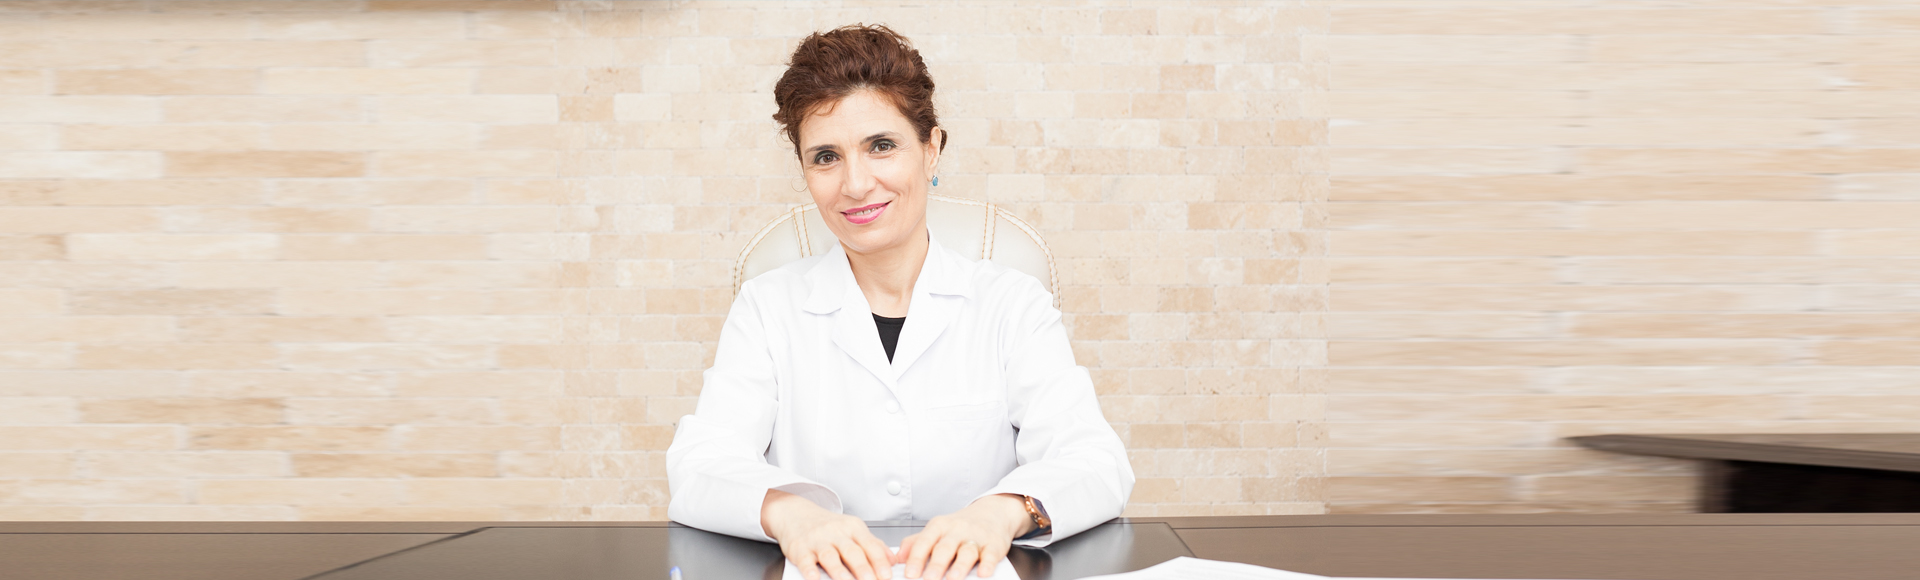 Despre doamna Dr. Cristina Farcaș